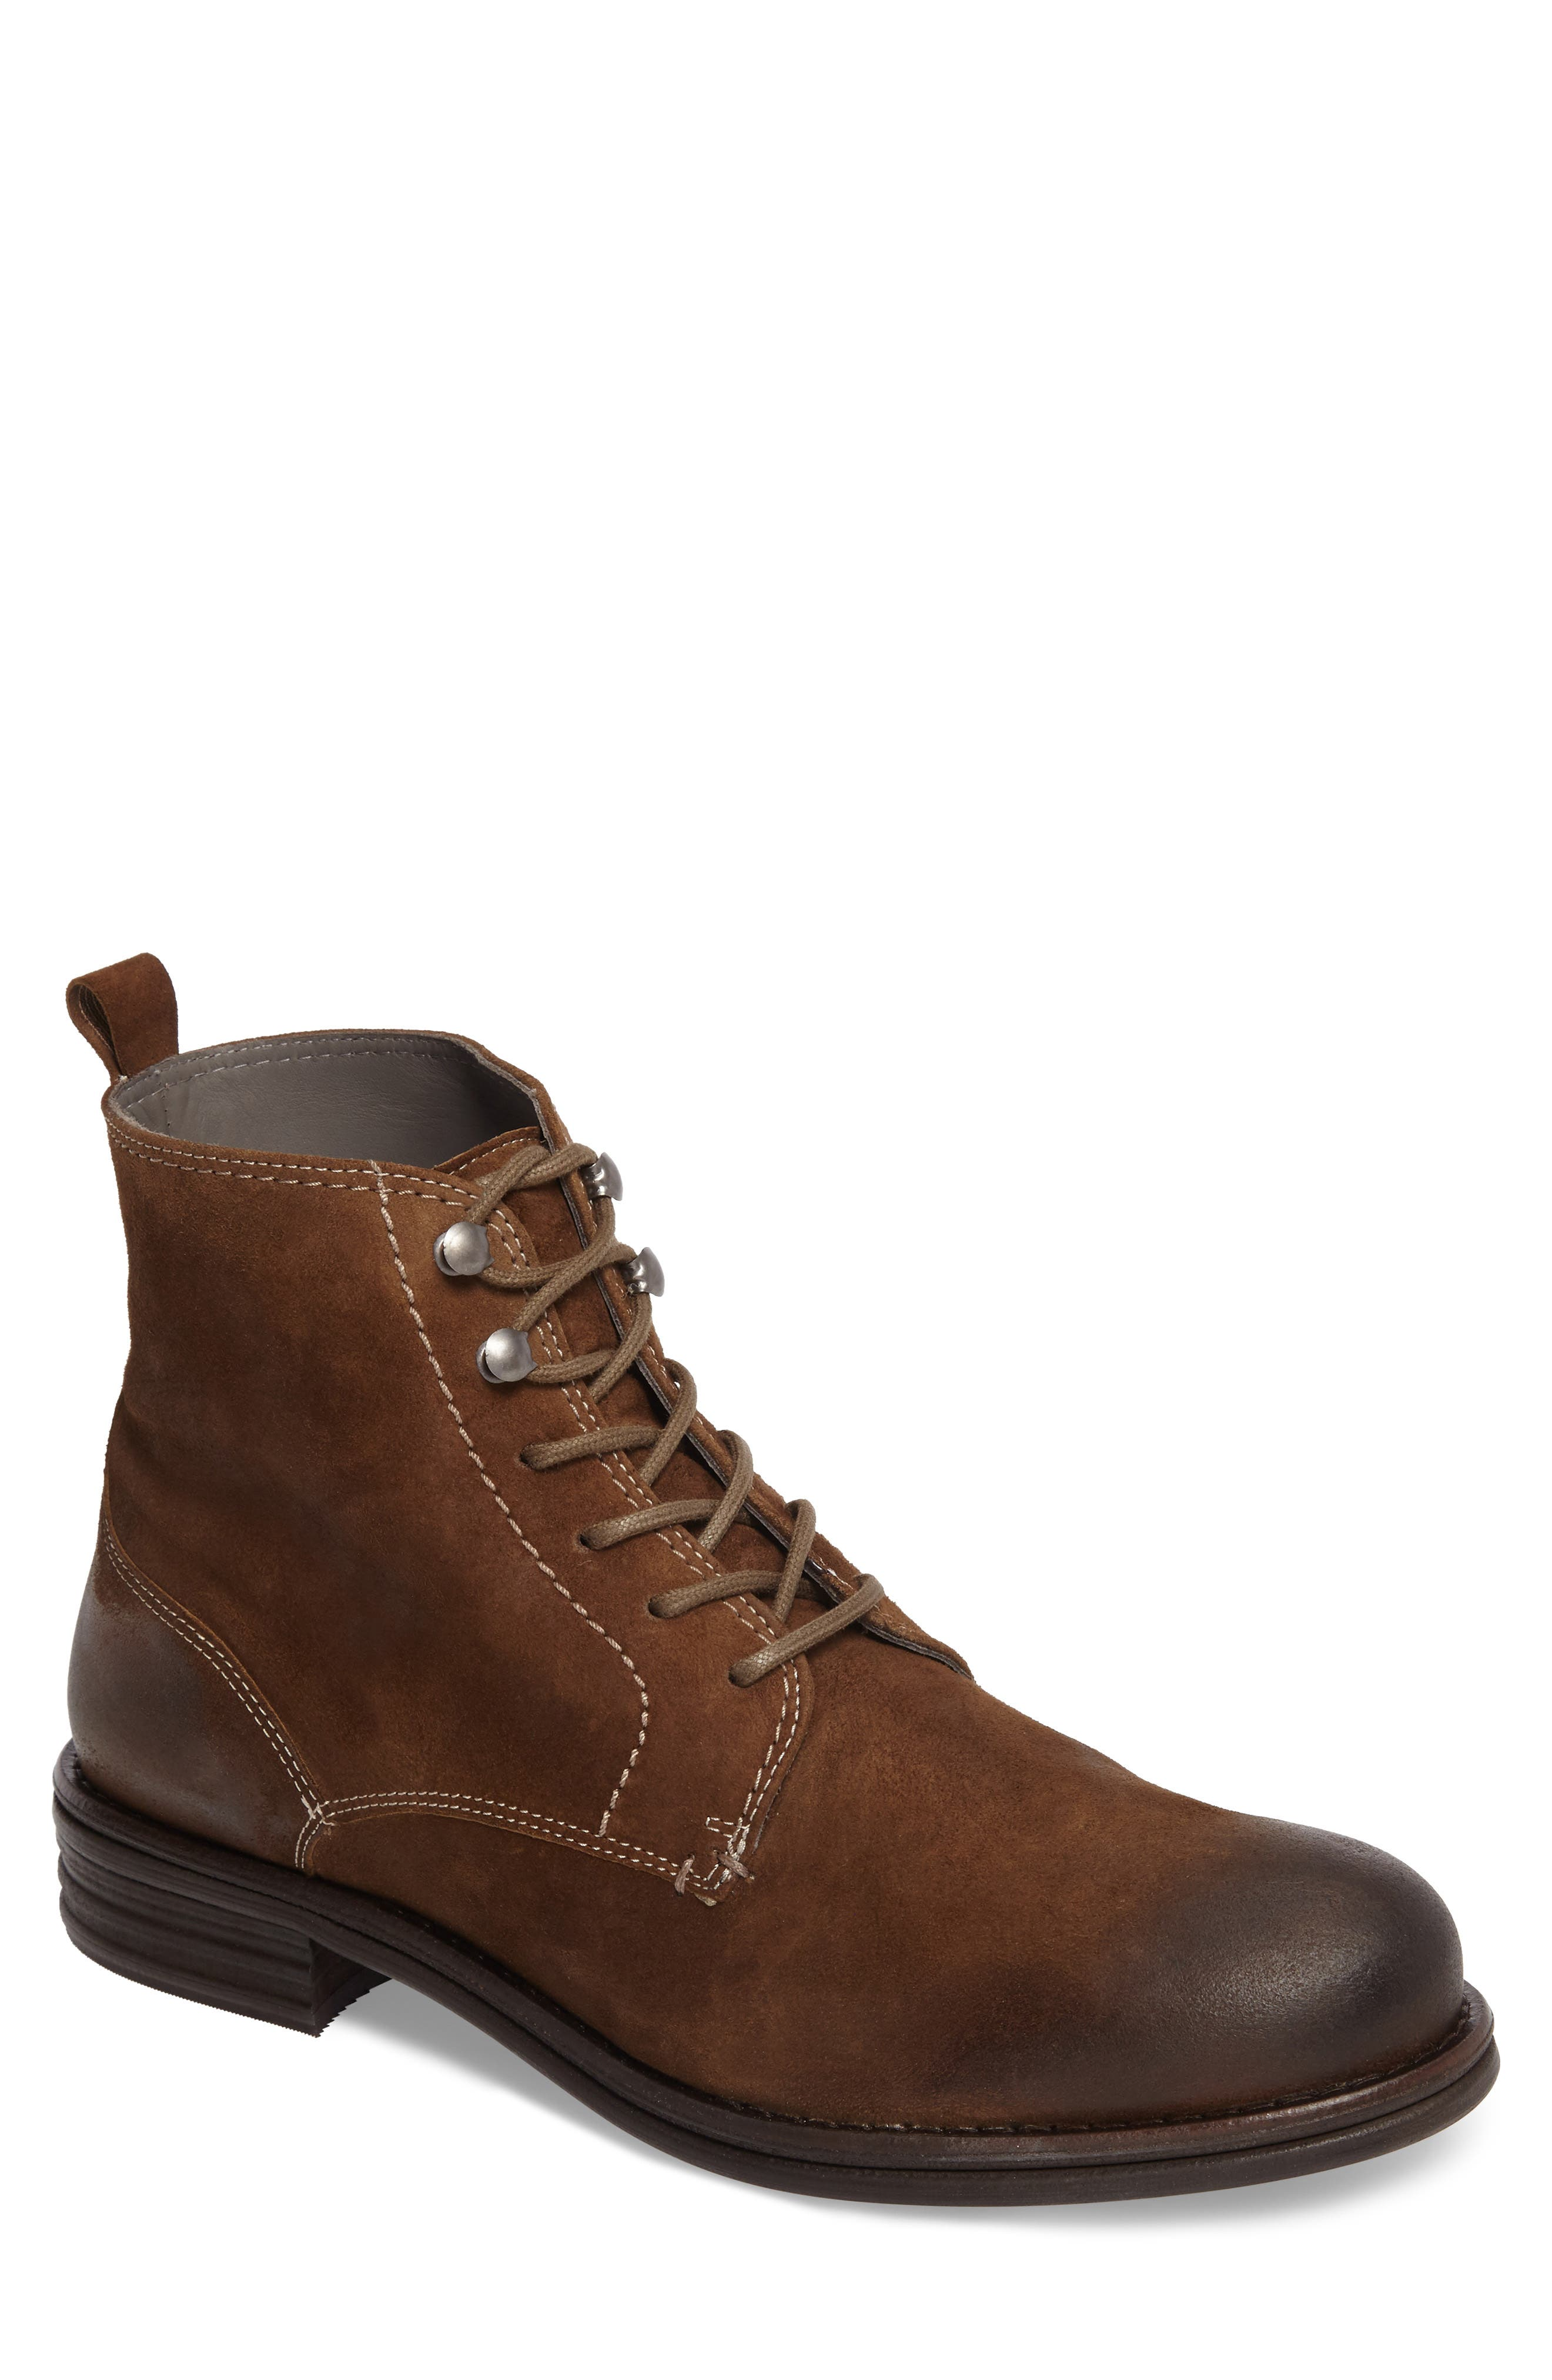 Cordie Plain Toe Boot,                         Main,                         color, Oliva Suede